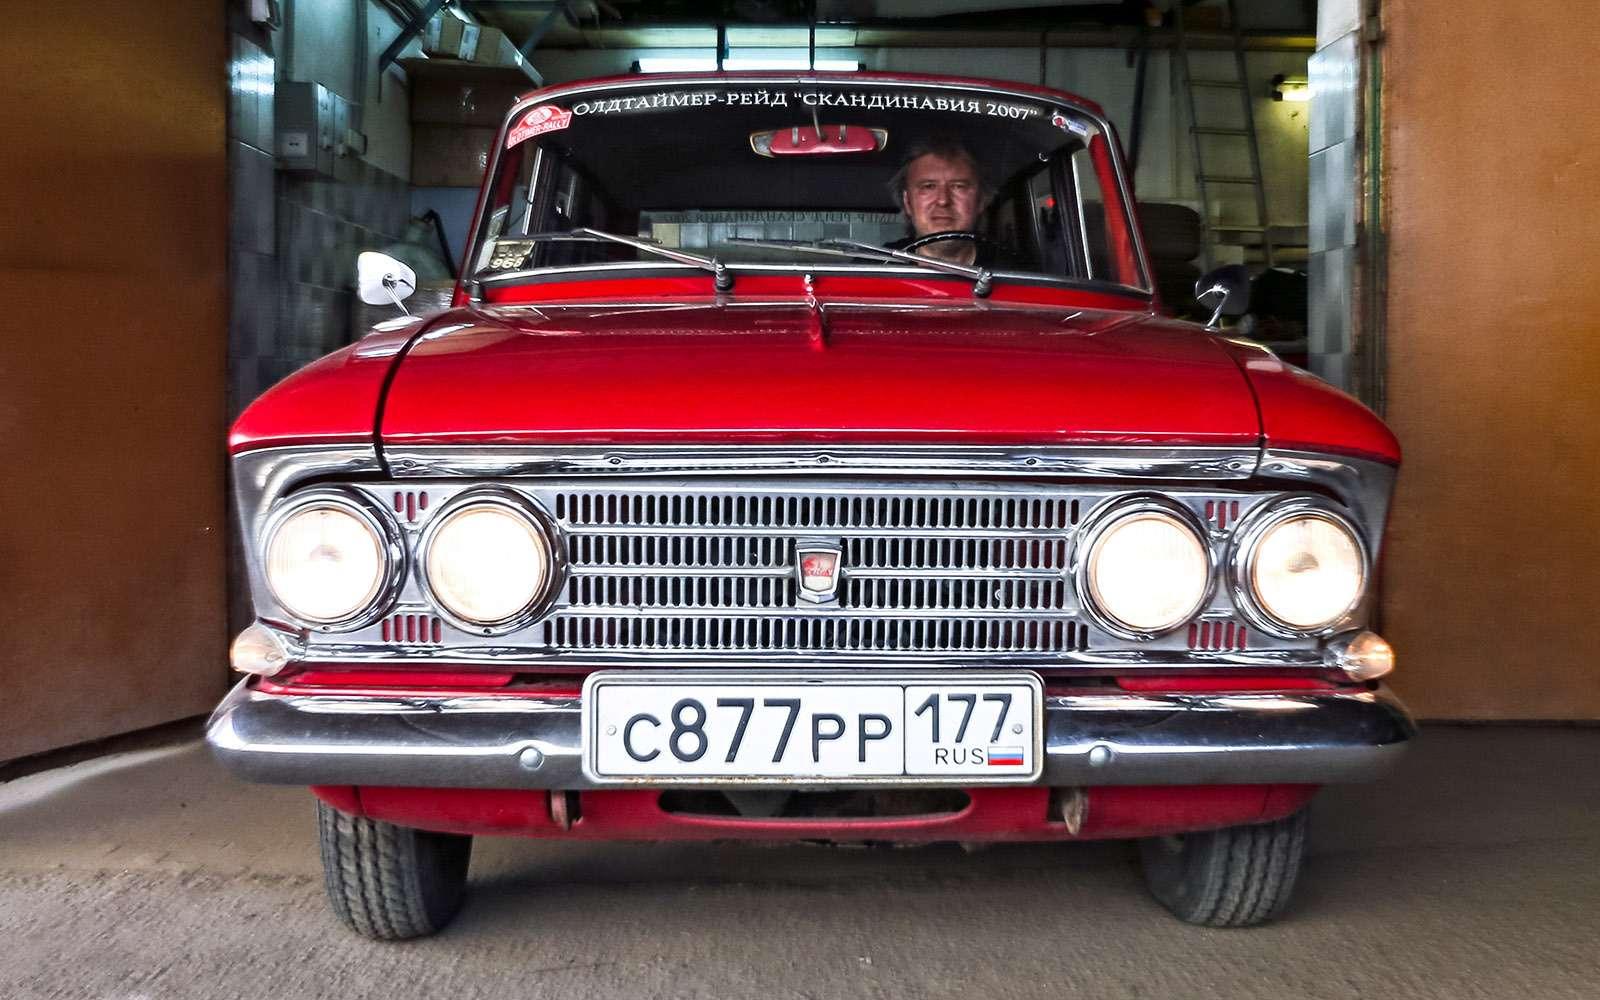 Среднее техническое: обслуживаем Москвич, как 40лет назад— фото 651566